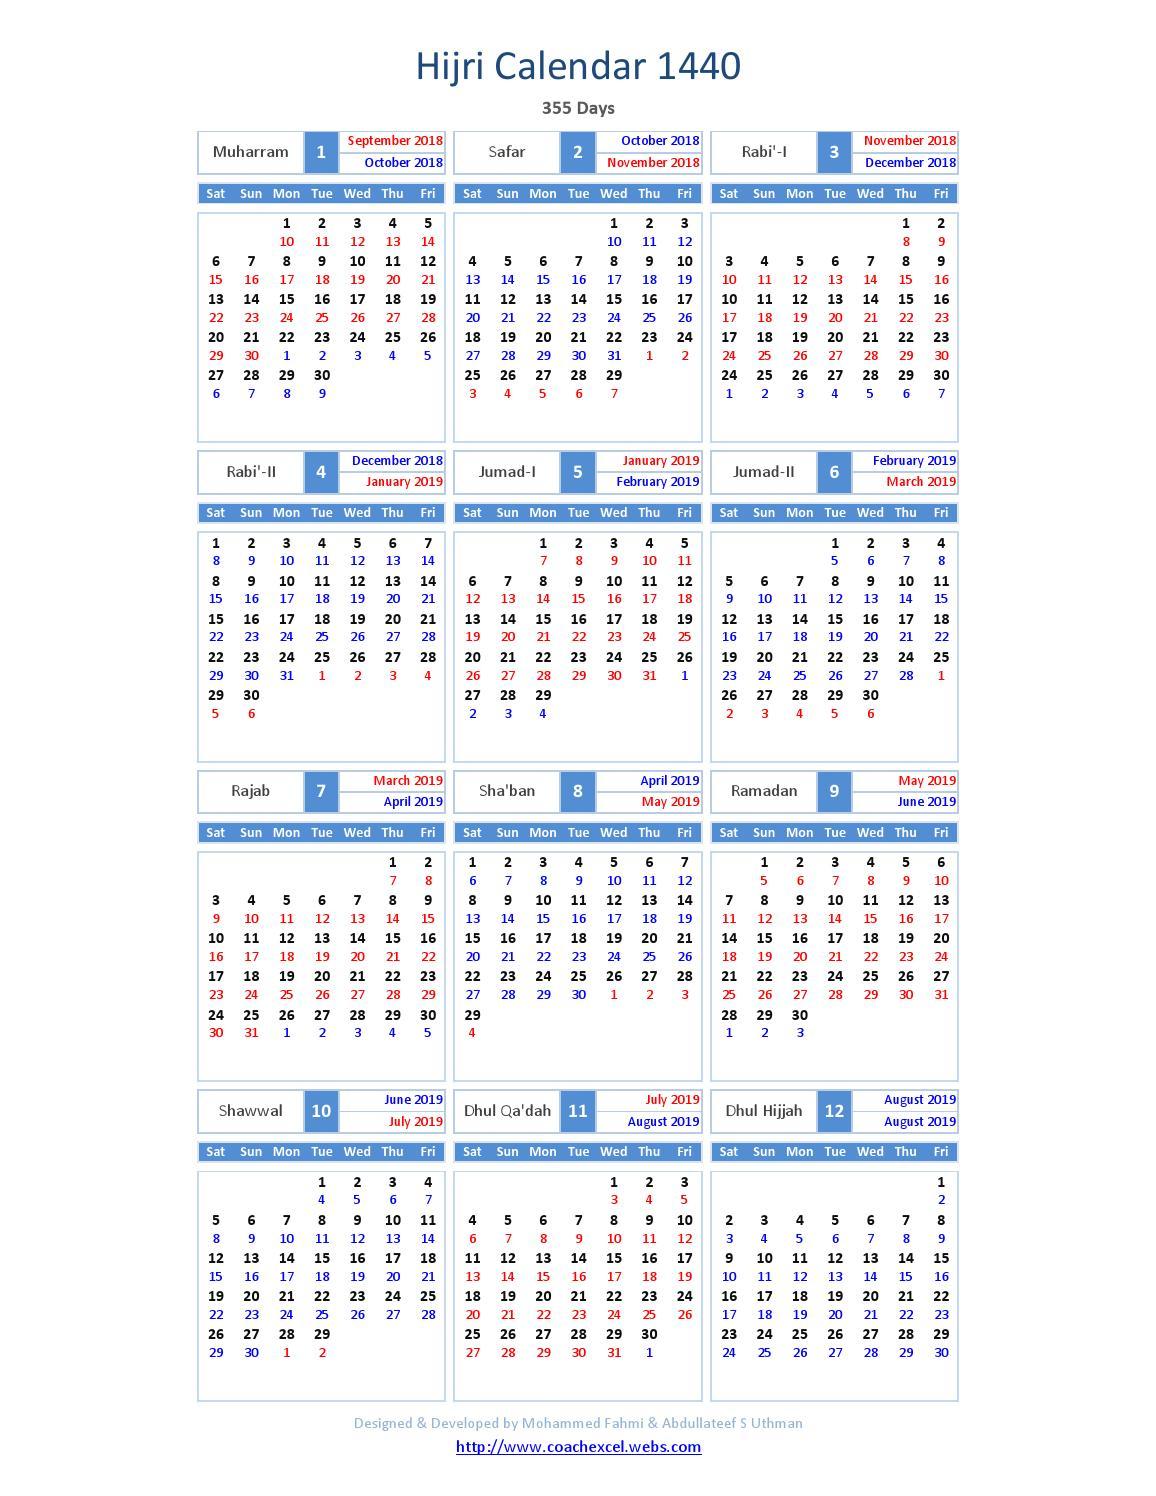 Hijri Calendar 1440 By International Moon Calendar  Issuu intended for 1440 Hijri Calendar